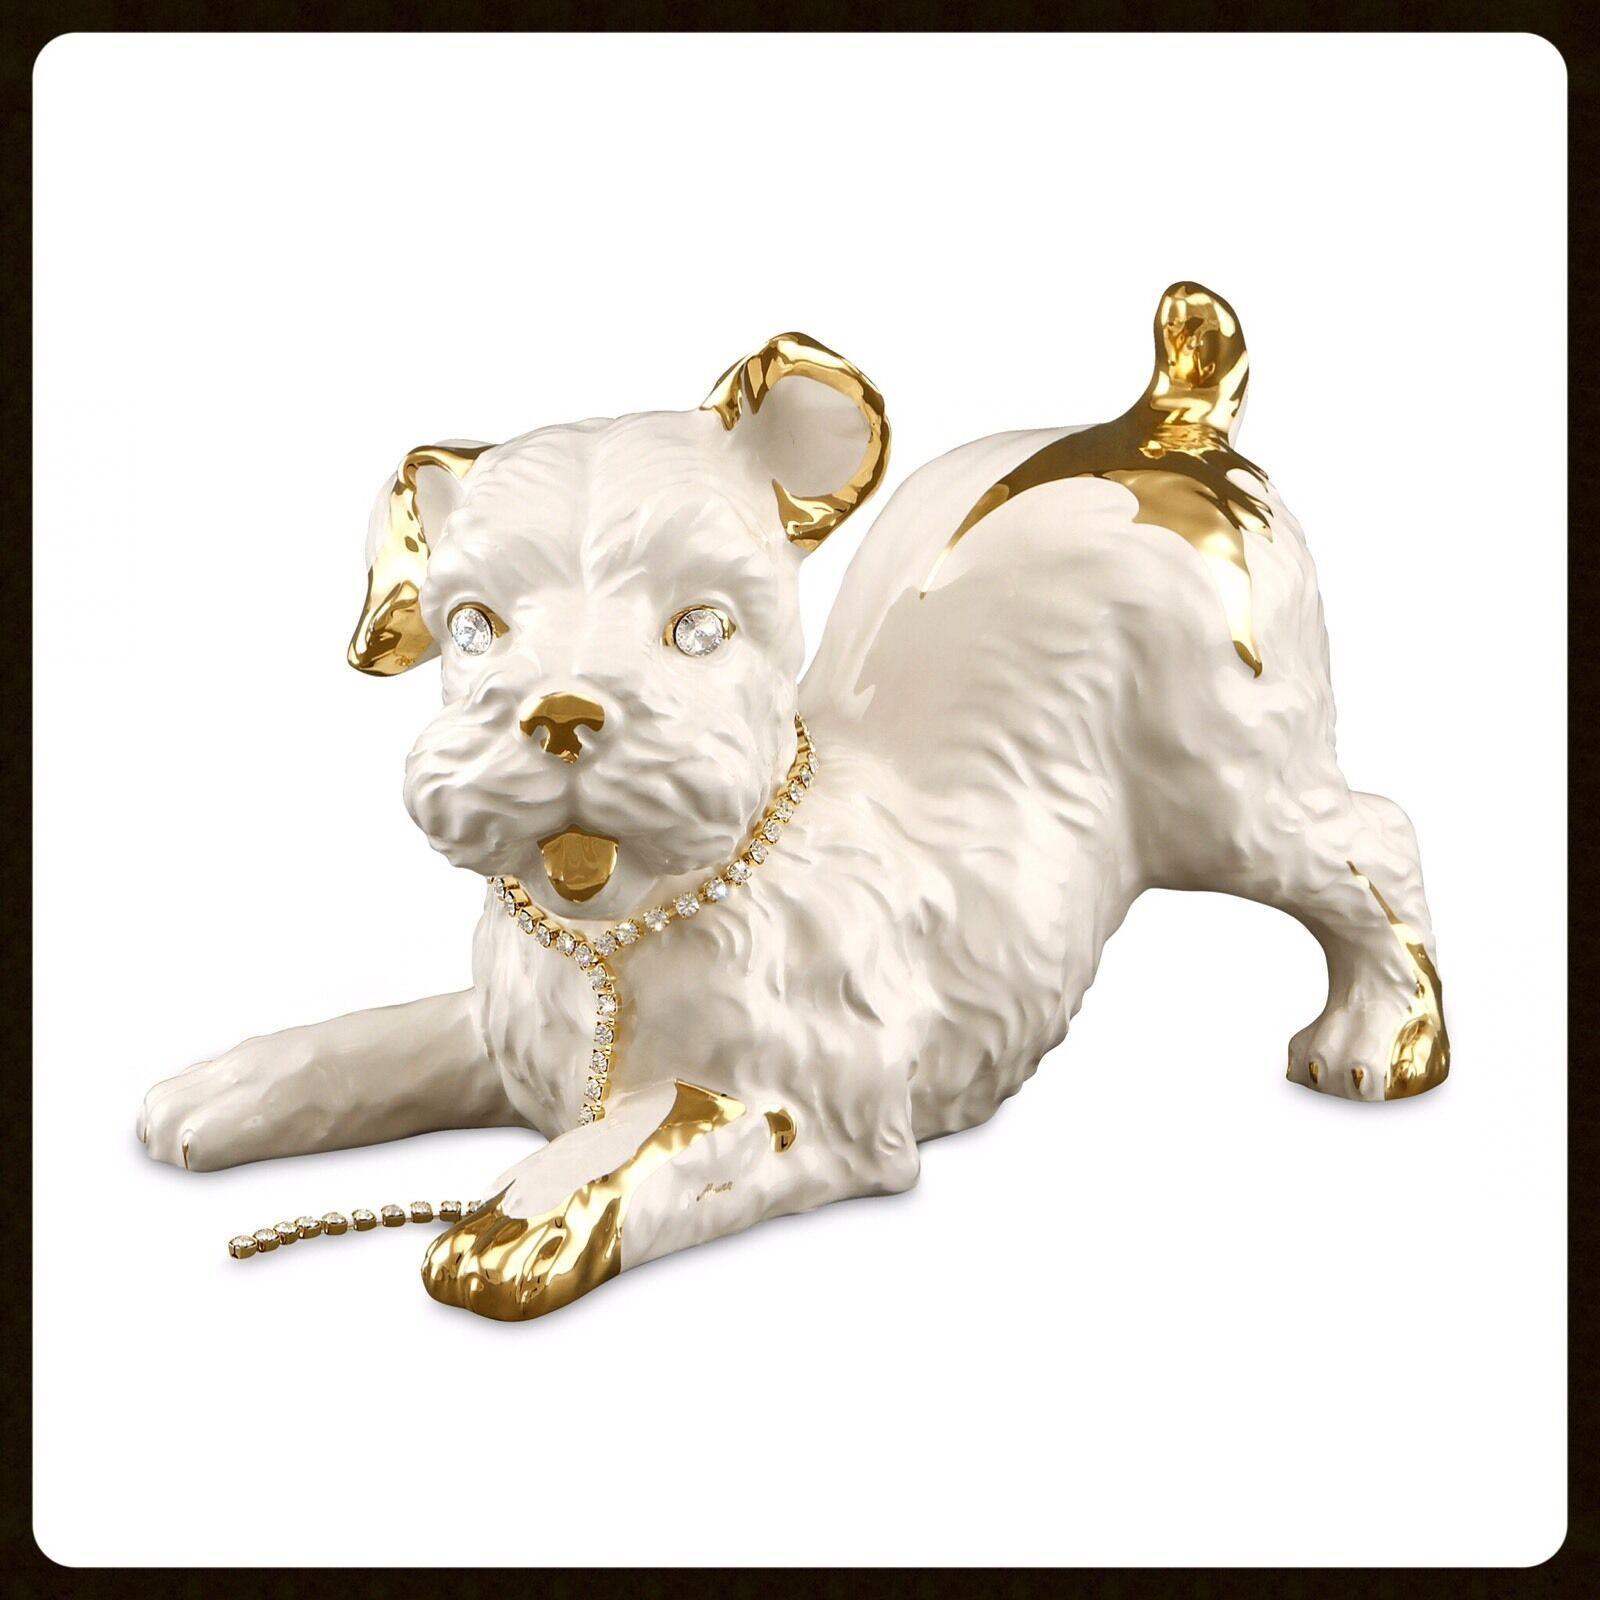 Keramik Terrier Hundefigur Dog Swarovski  24K Gold Handarbeit aus Italien